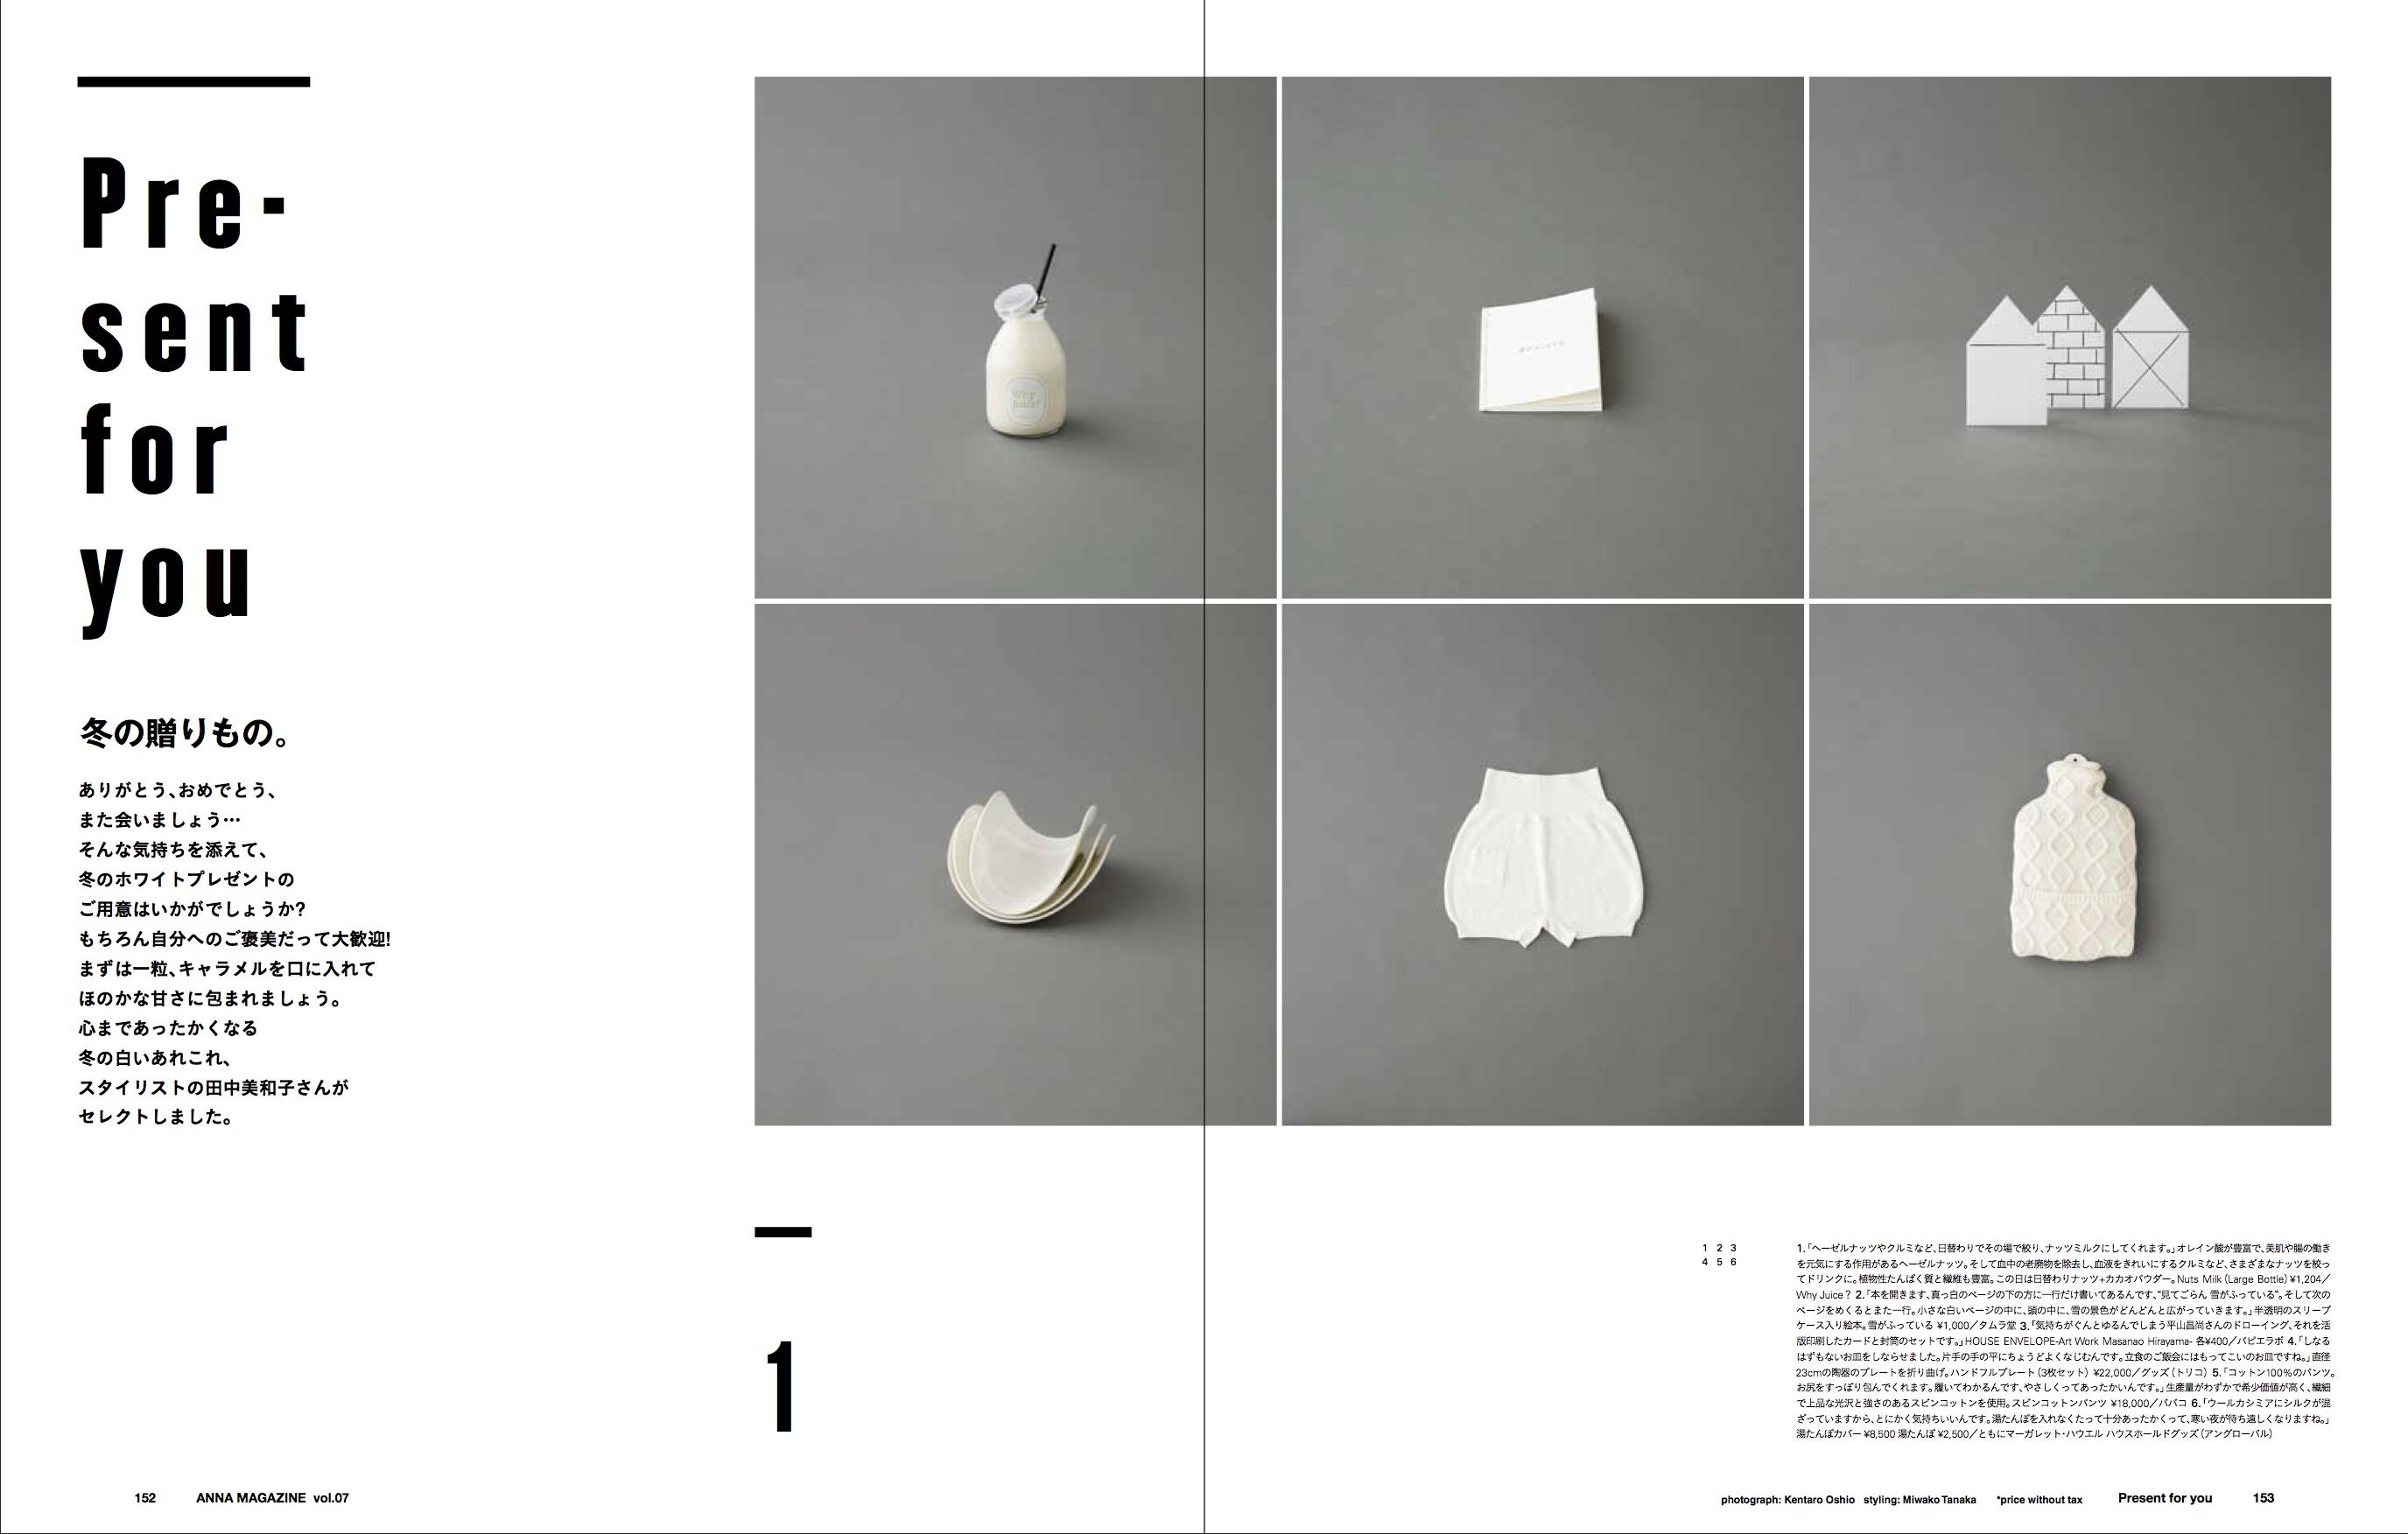 anna magazine vol.7 P43